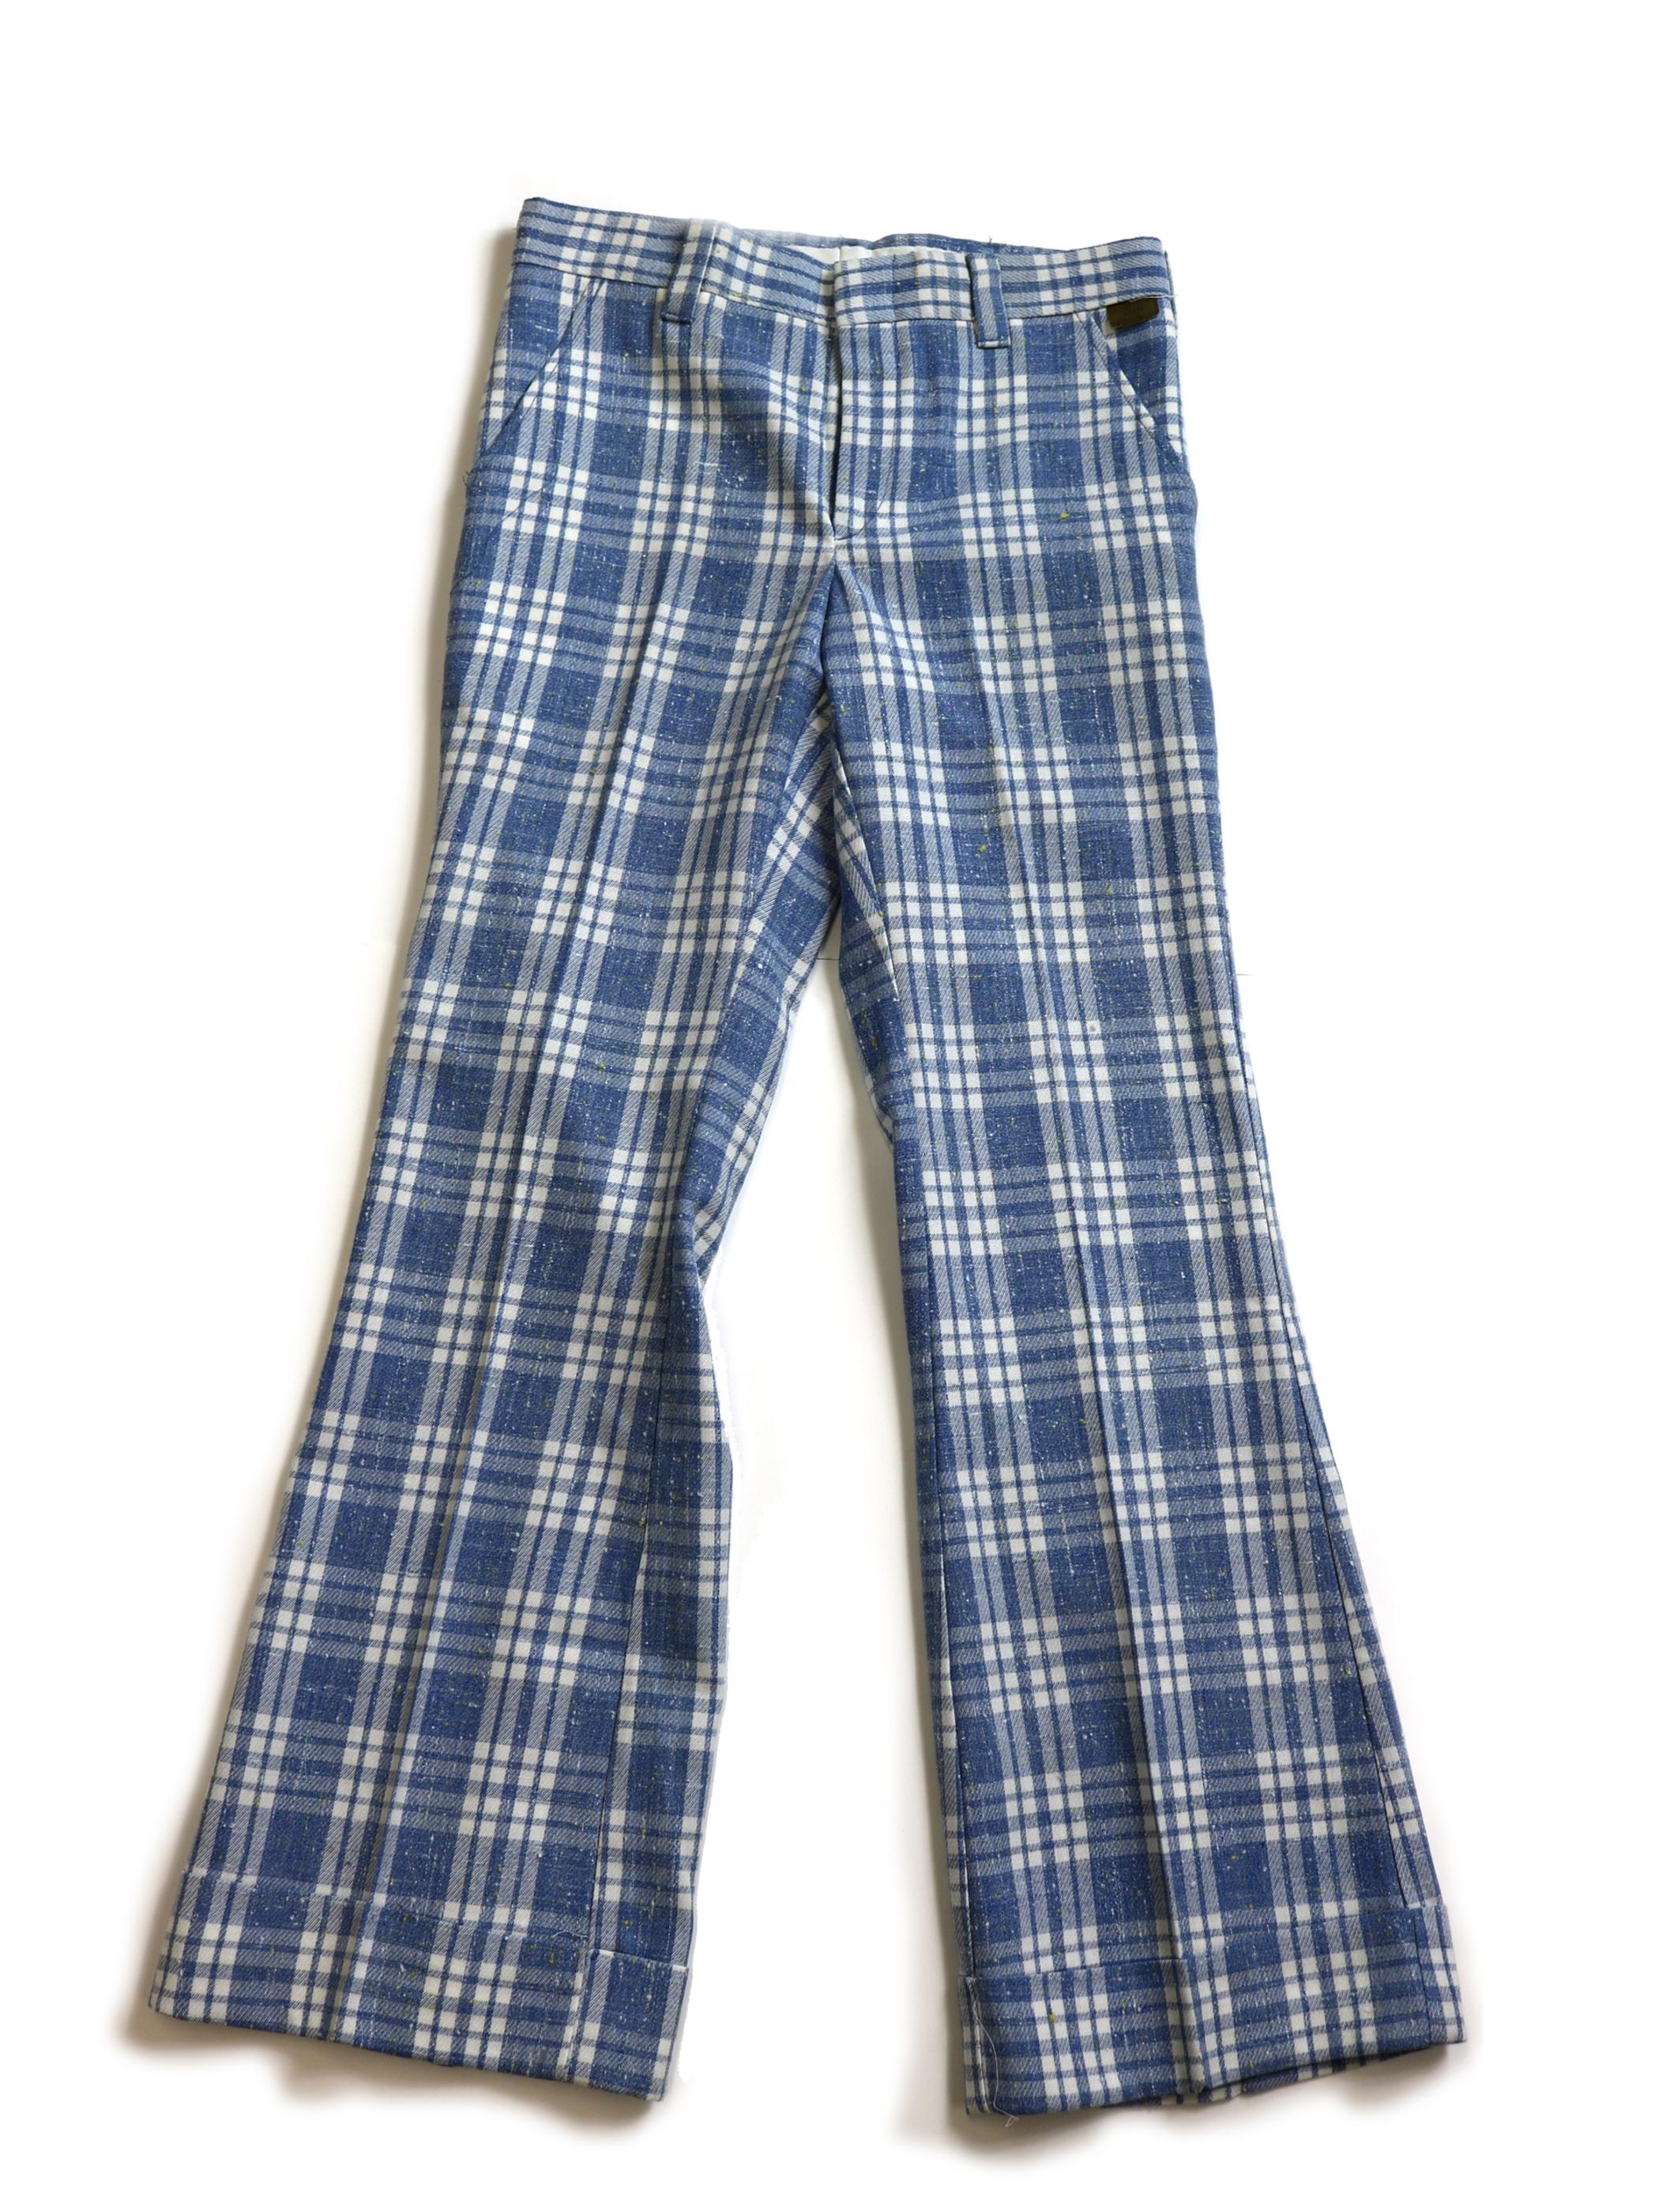 1970s Maverick Dead Stock Pants (Sax)